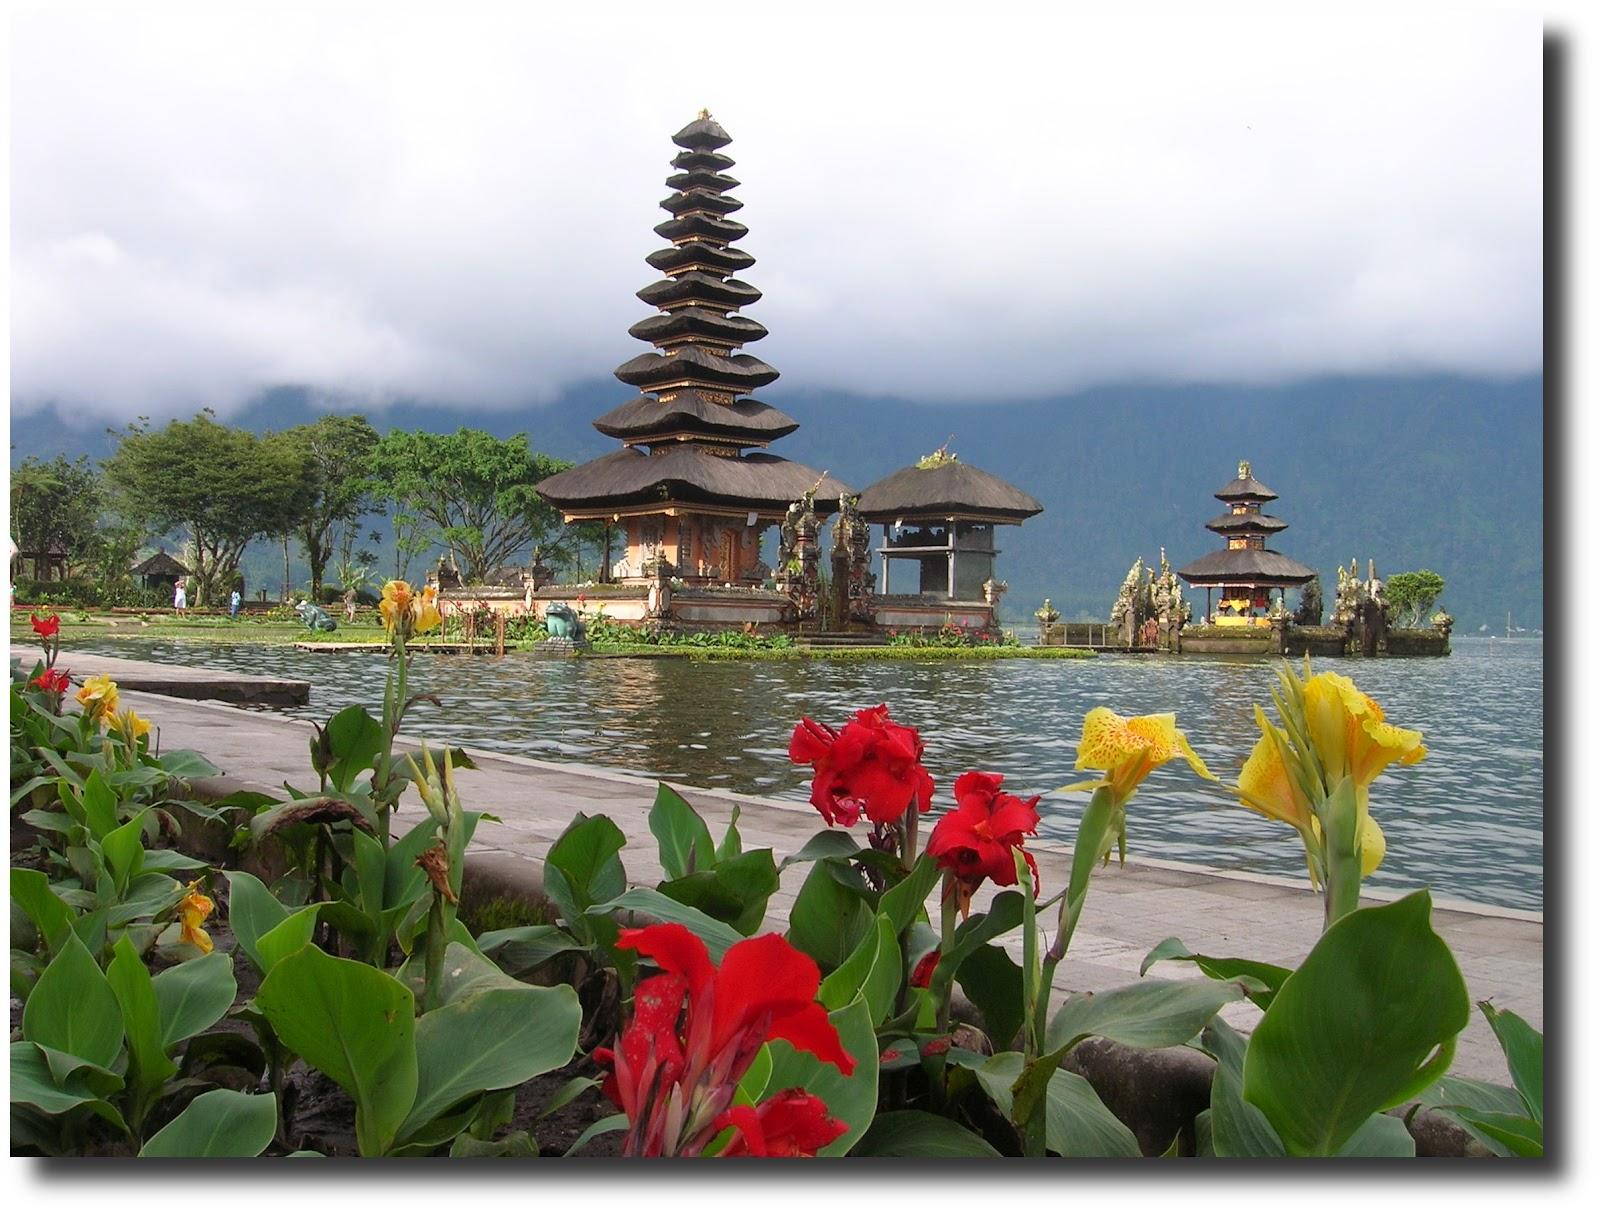 templo ulu danu, lago beratan, isla bali, indonesia, vuelta al mundo, round the world, La vuelta al mundo de Asun y Ricardo, mundoporlibre.com